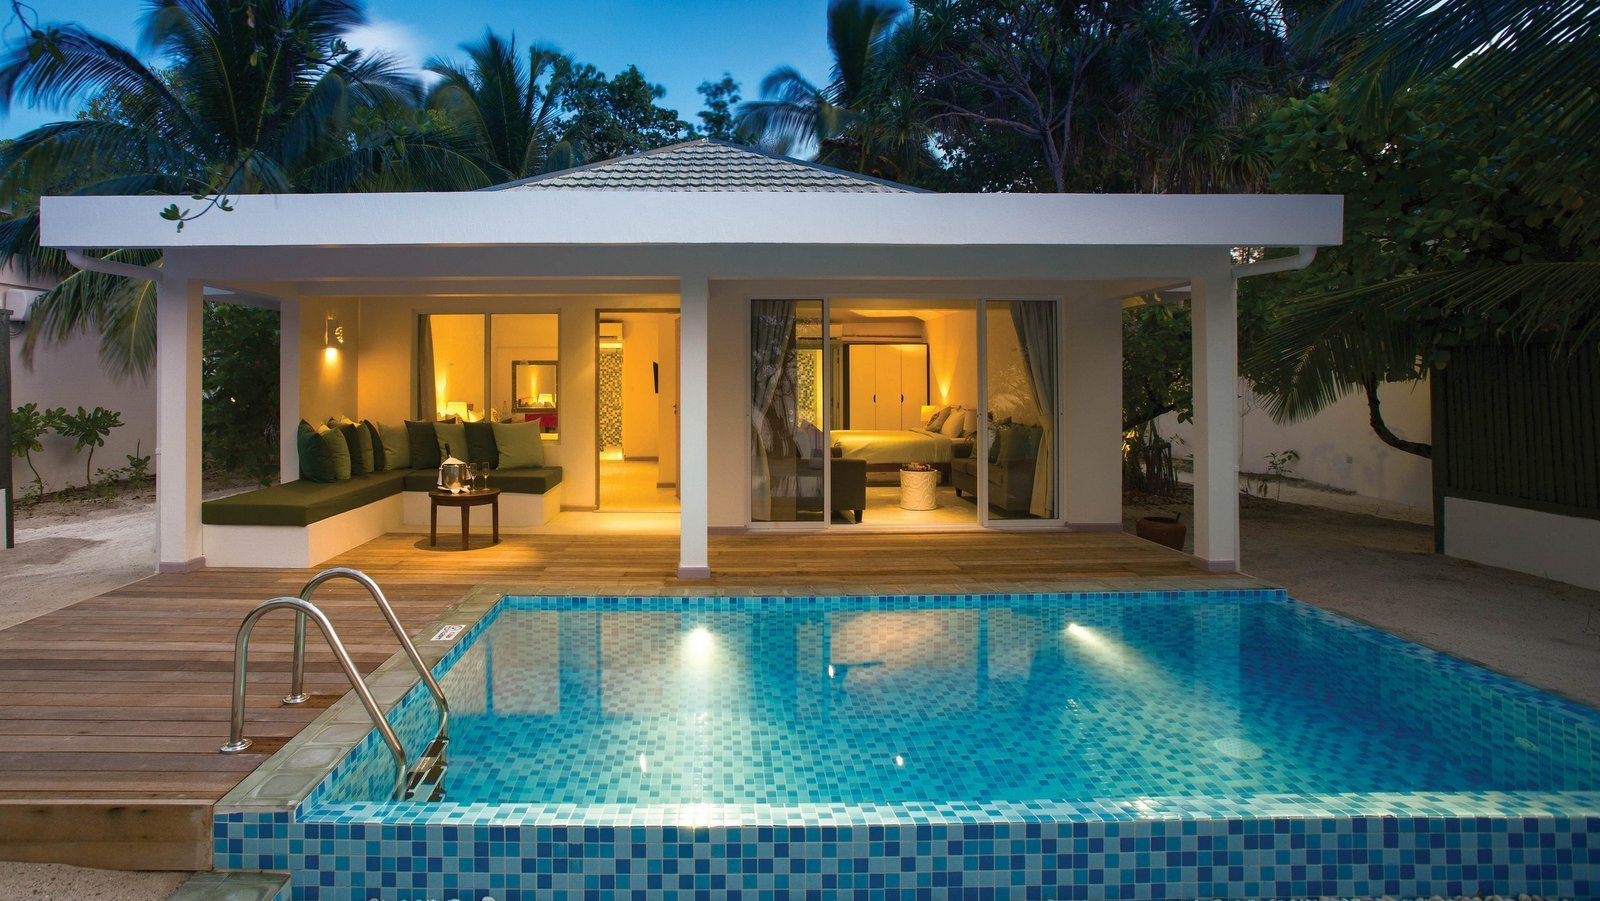 Мальдивы, отель OBLU by Atmosphere at Helengeli, номер Beach Suite with Pool